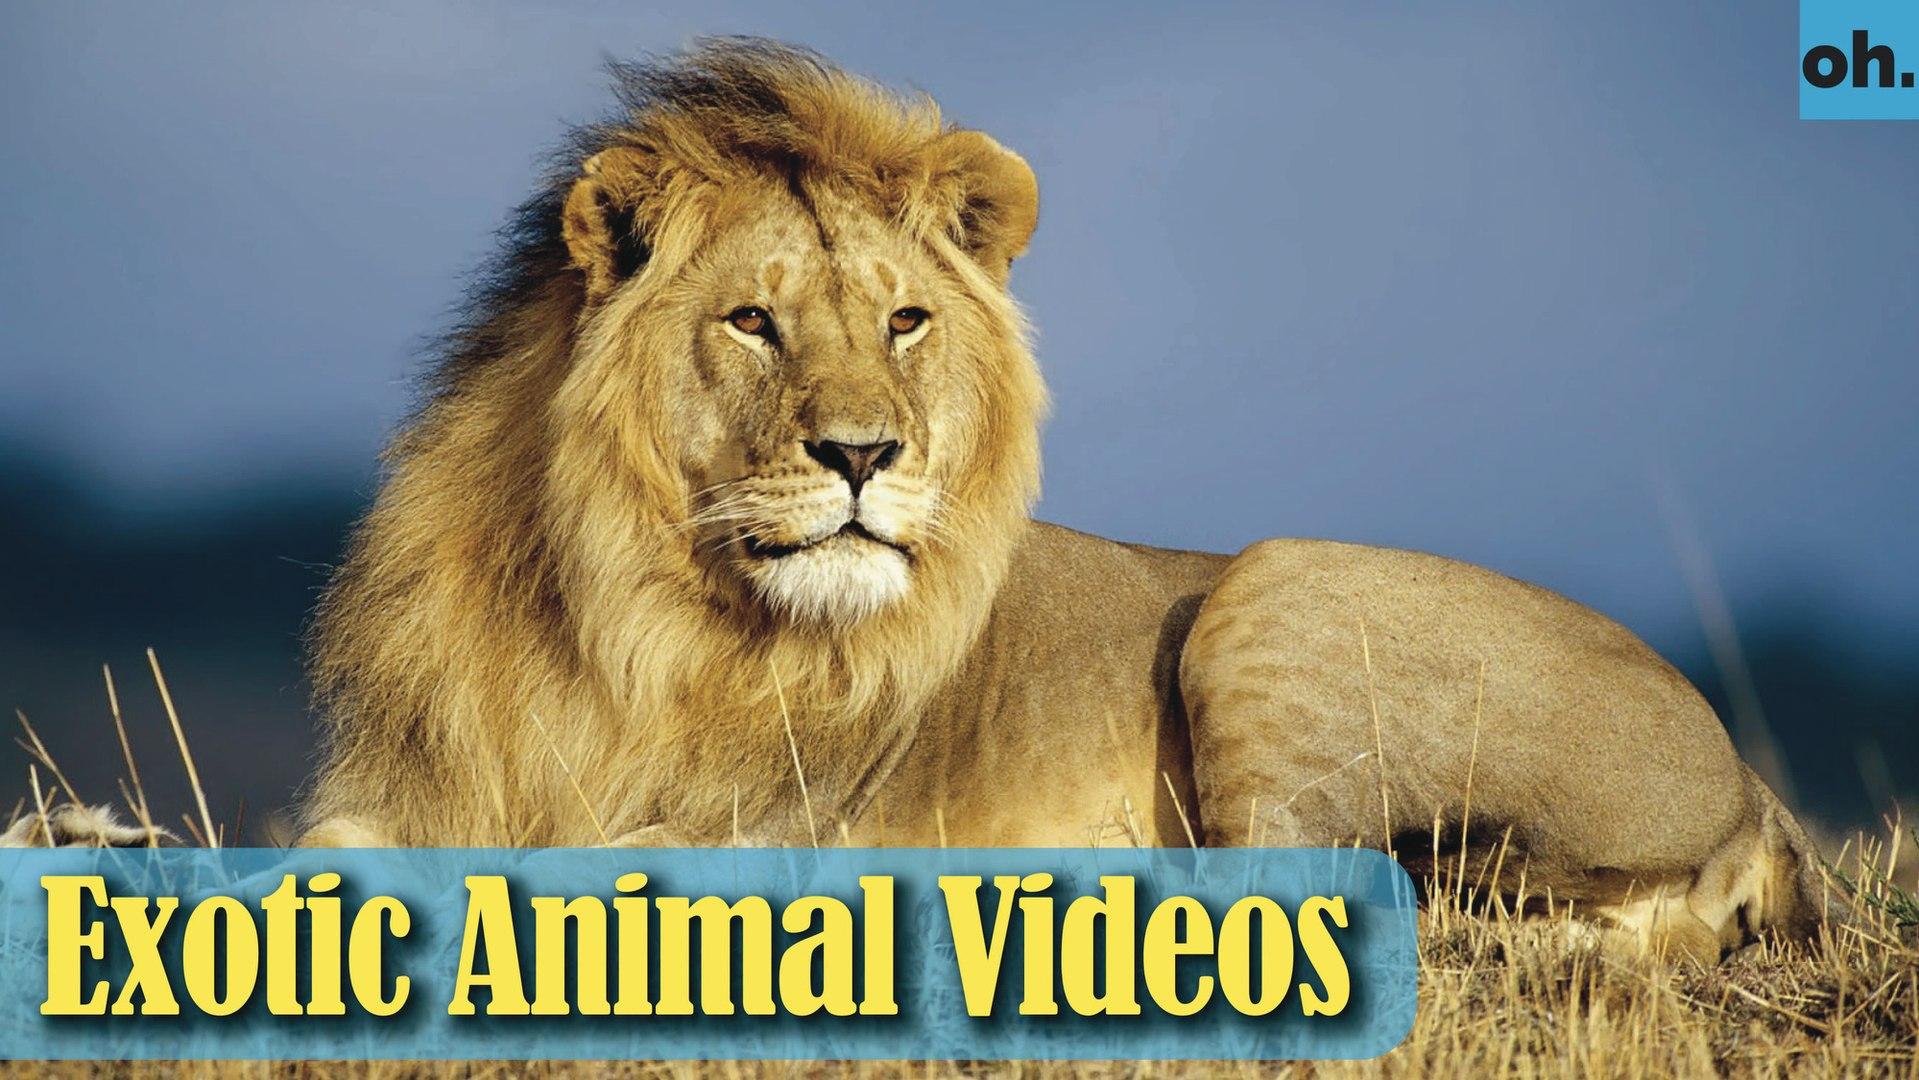 Animal Video - Wild Animals - Rainforest  Animals - Rare Animals Zoo - Exotic Animals For Sale P2